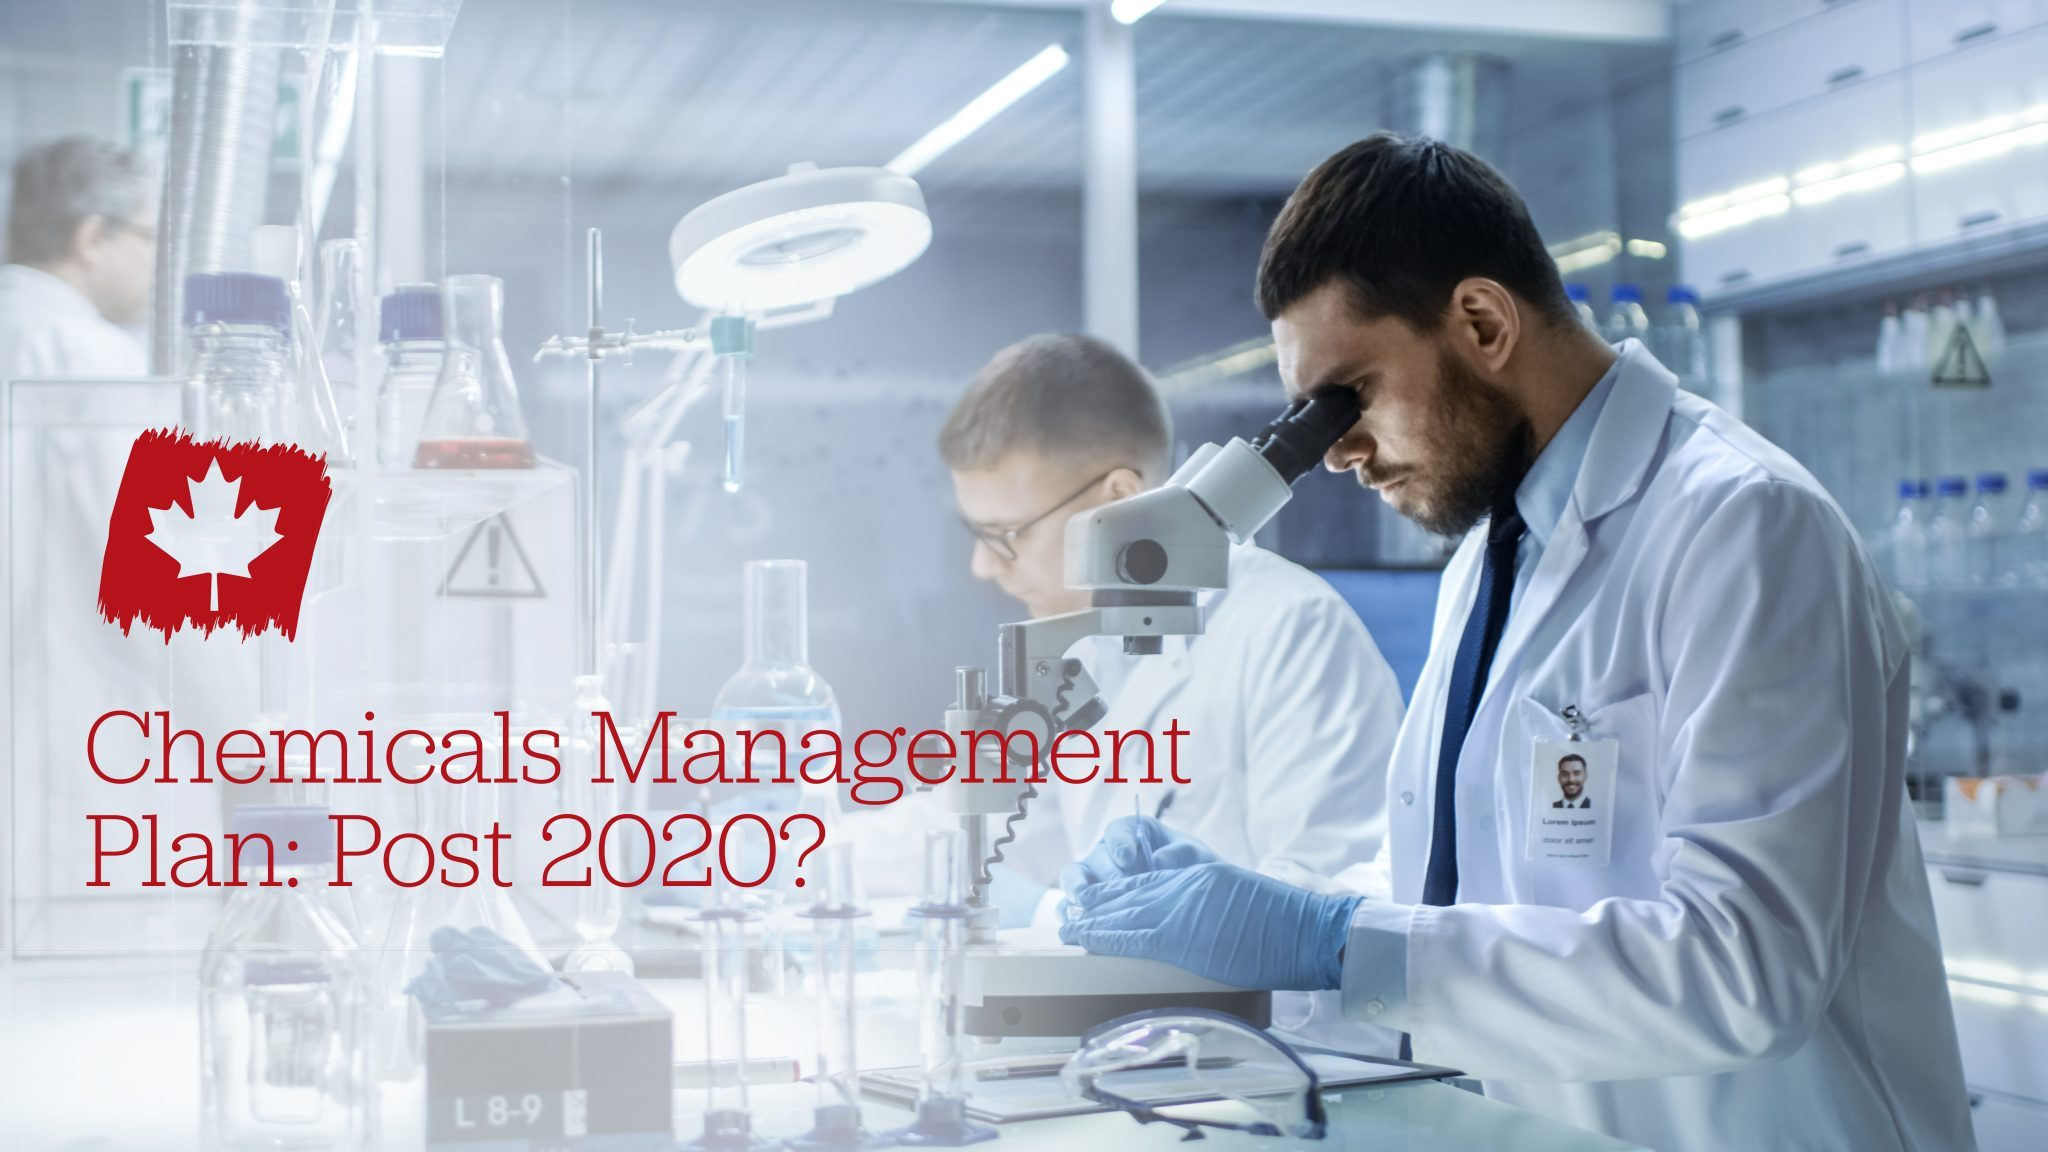 Chemicals_Management_Plan_Post_2020